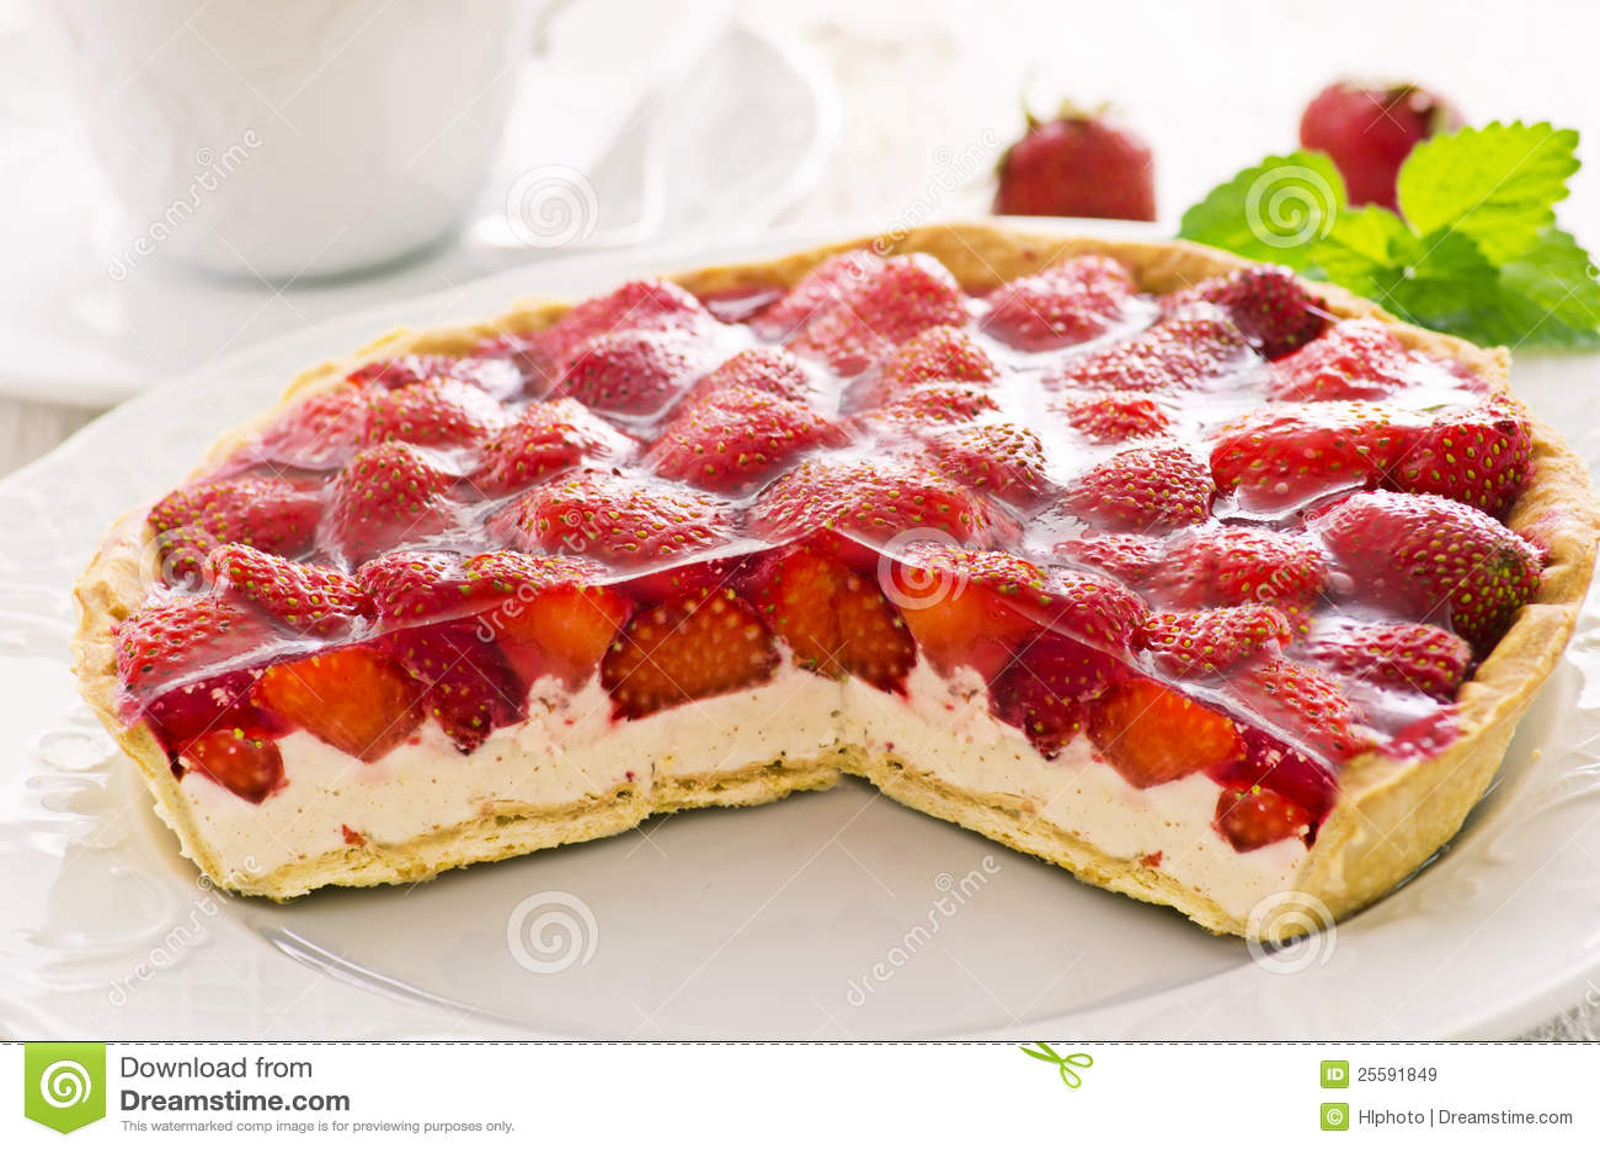 Strawberry Tart Royalty Free Stock Images - Image: 25591849